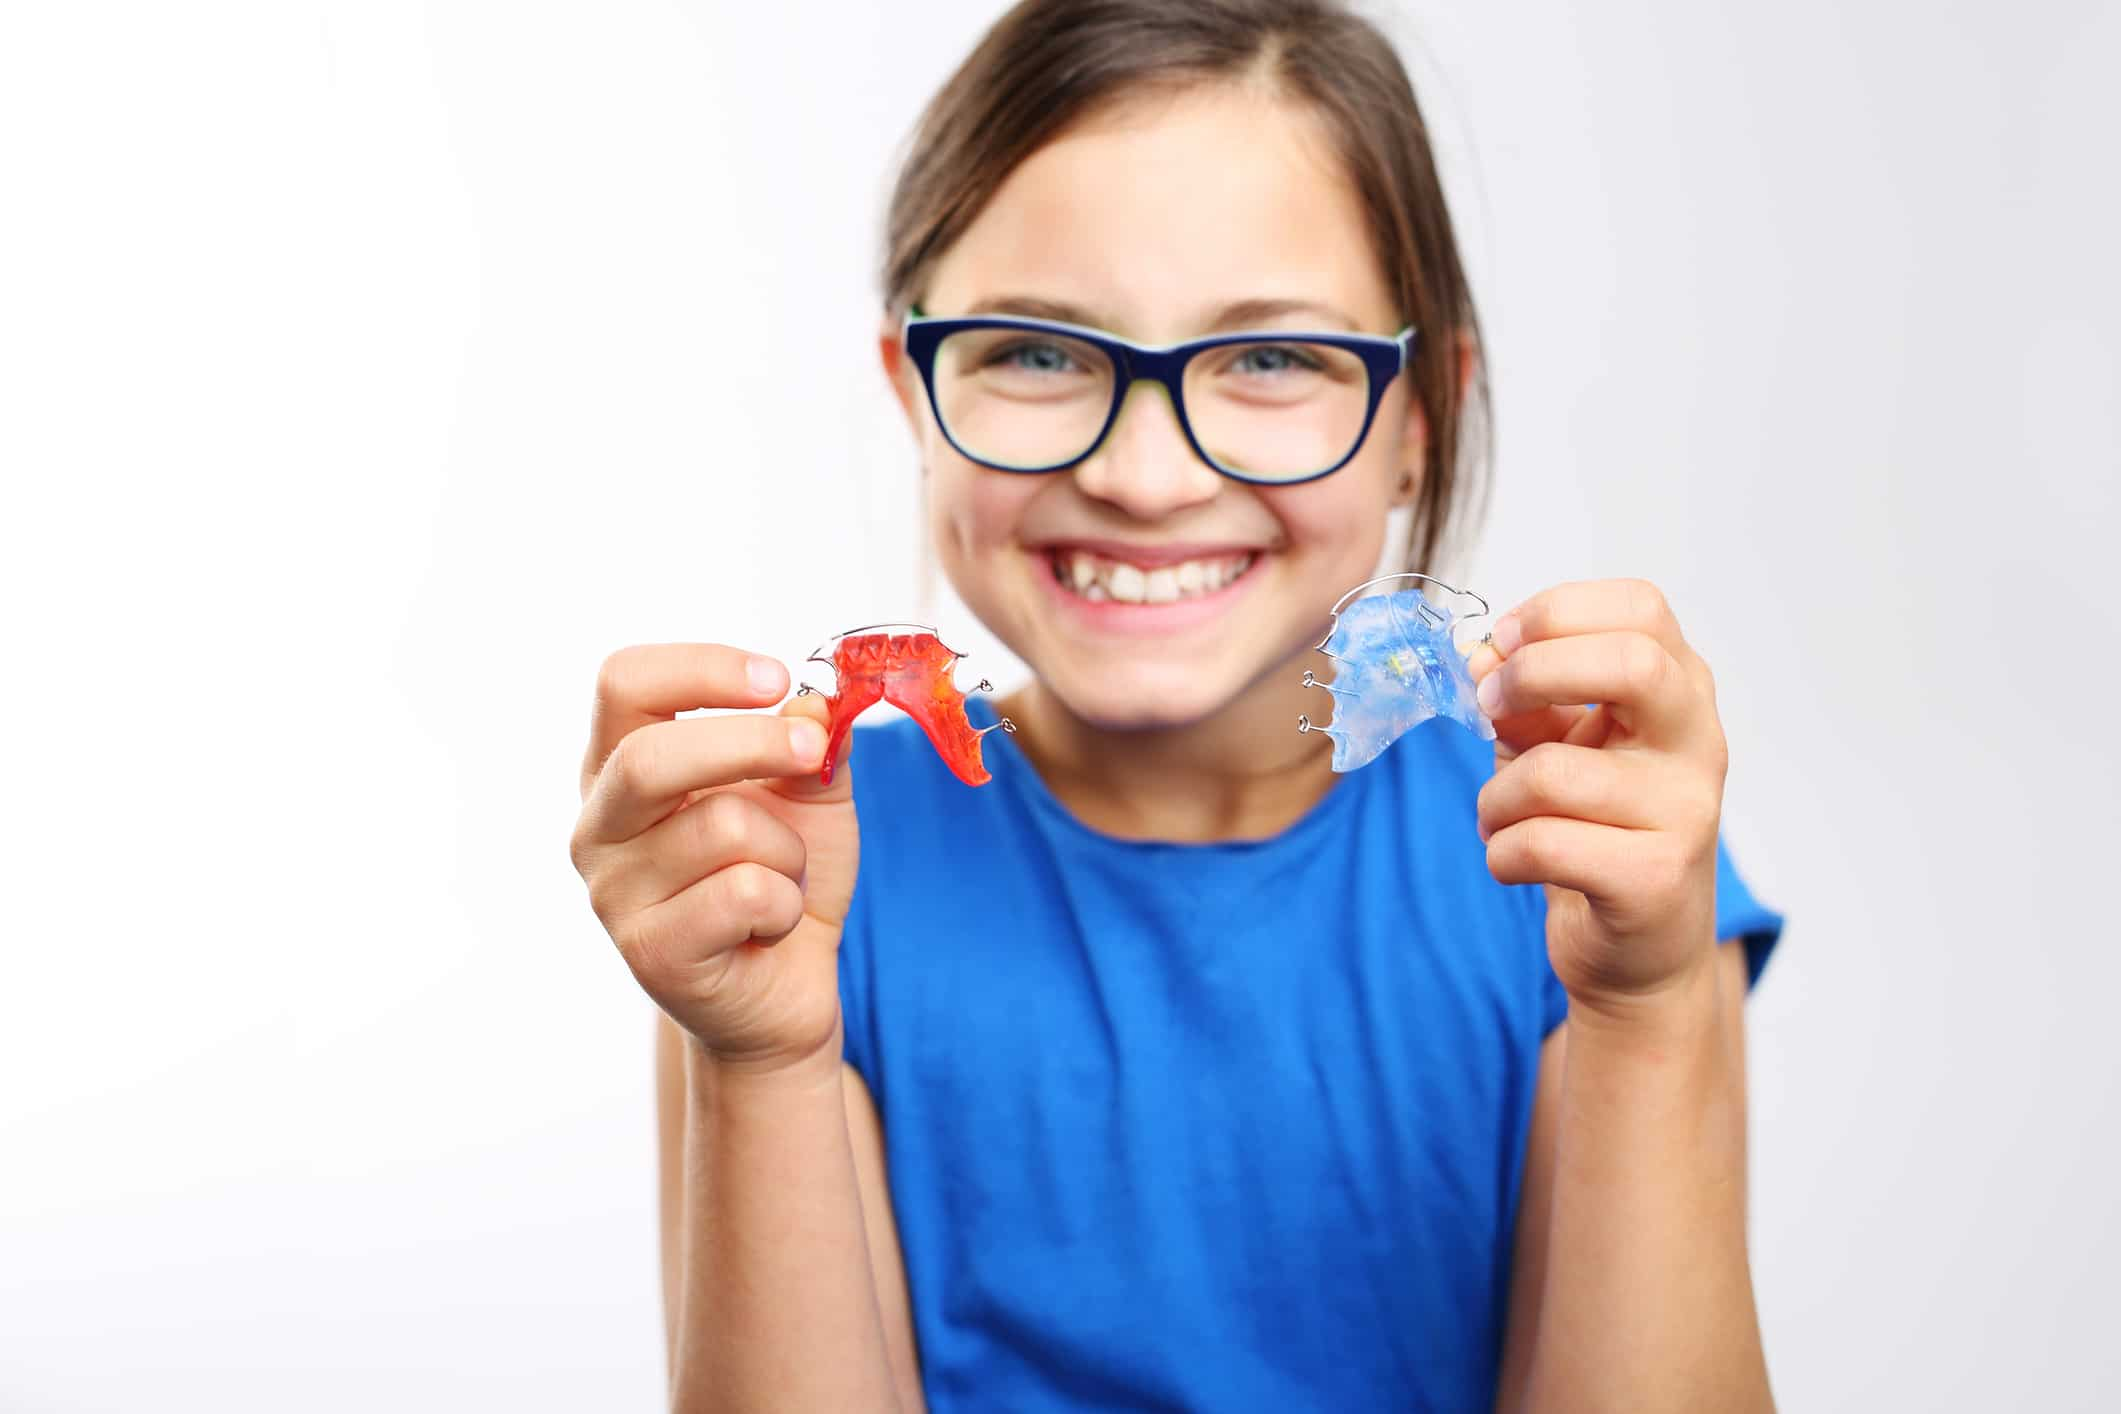 Child holding a retainer, Smile Envy Dental Group, Atlanta, GA